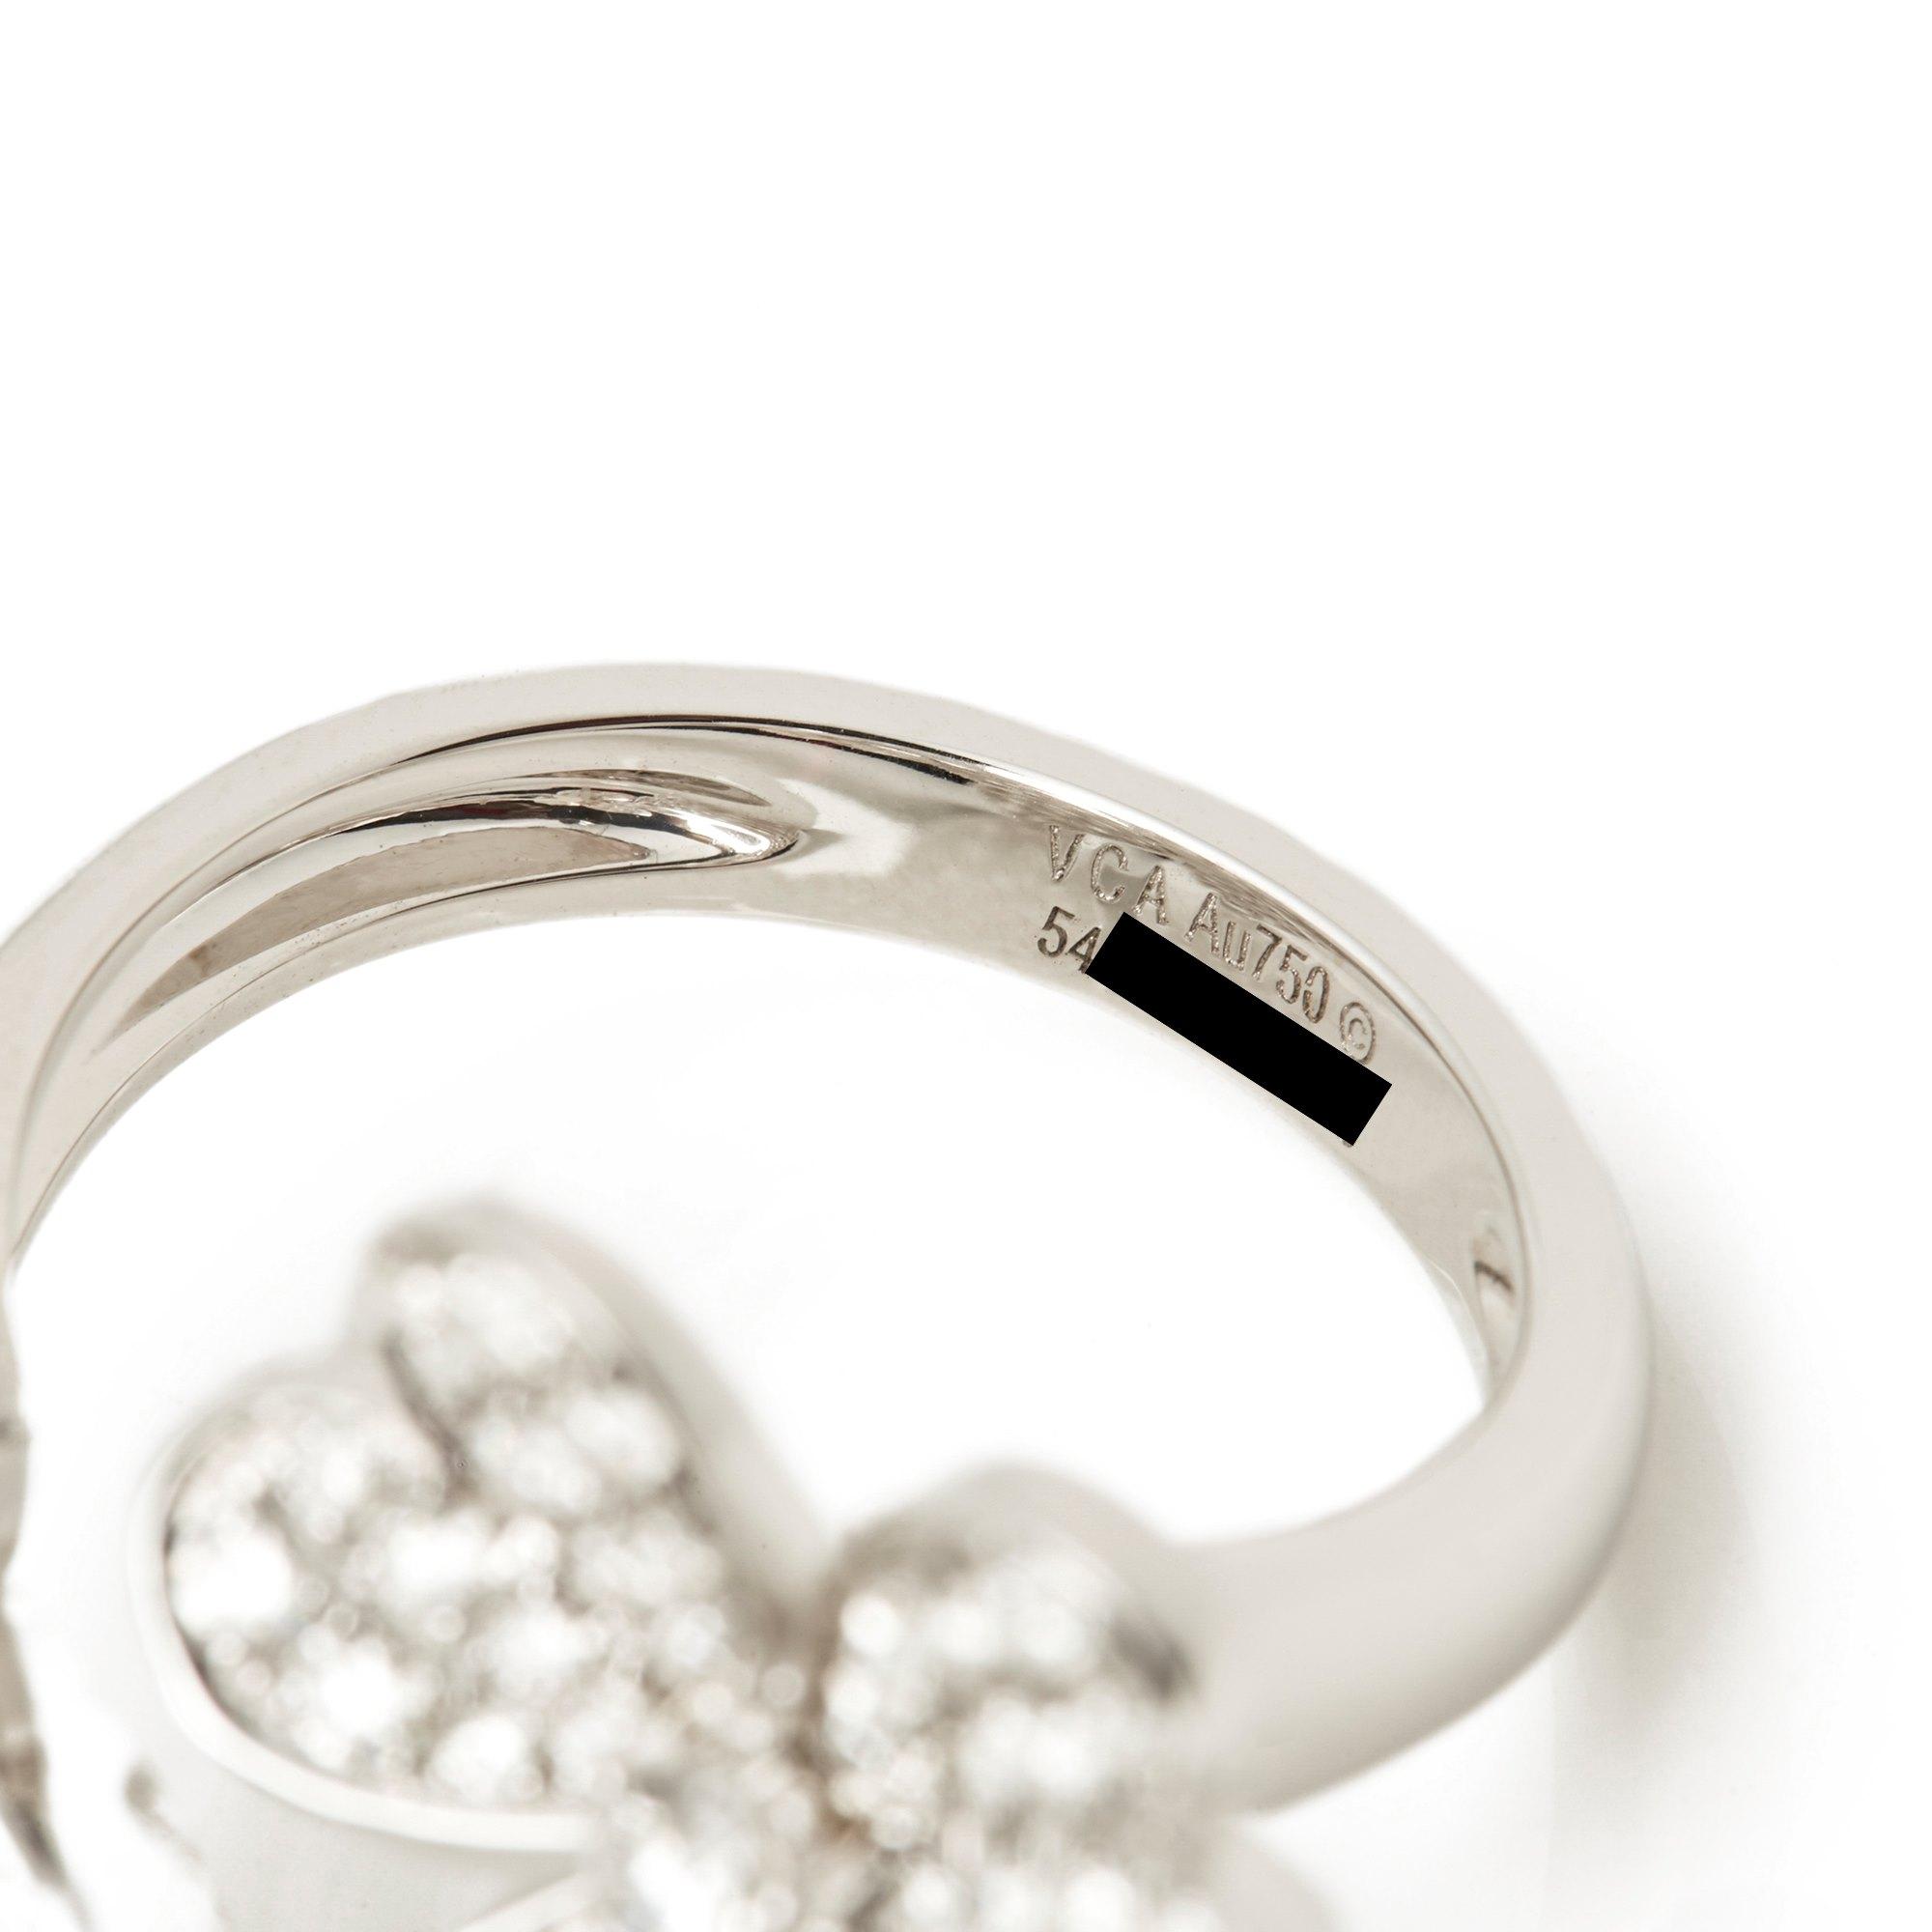 Van Cleef & Arpels 18k White Gold Diamond Frivole Between The Finger Ring